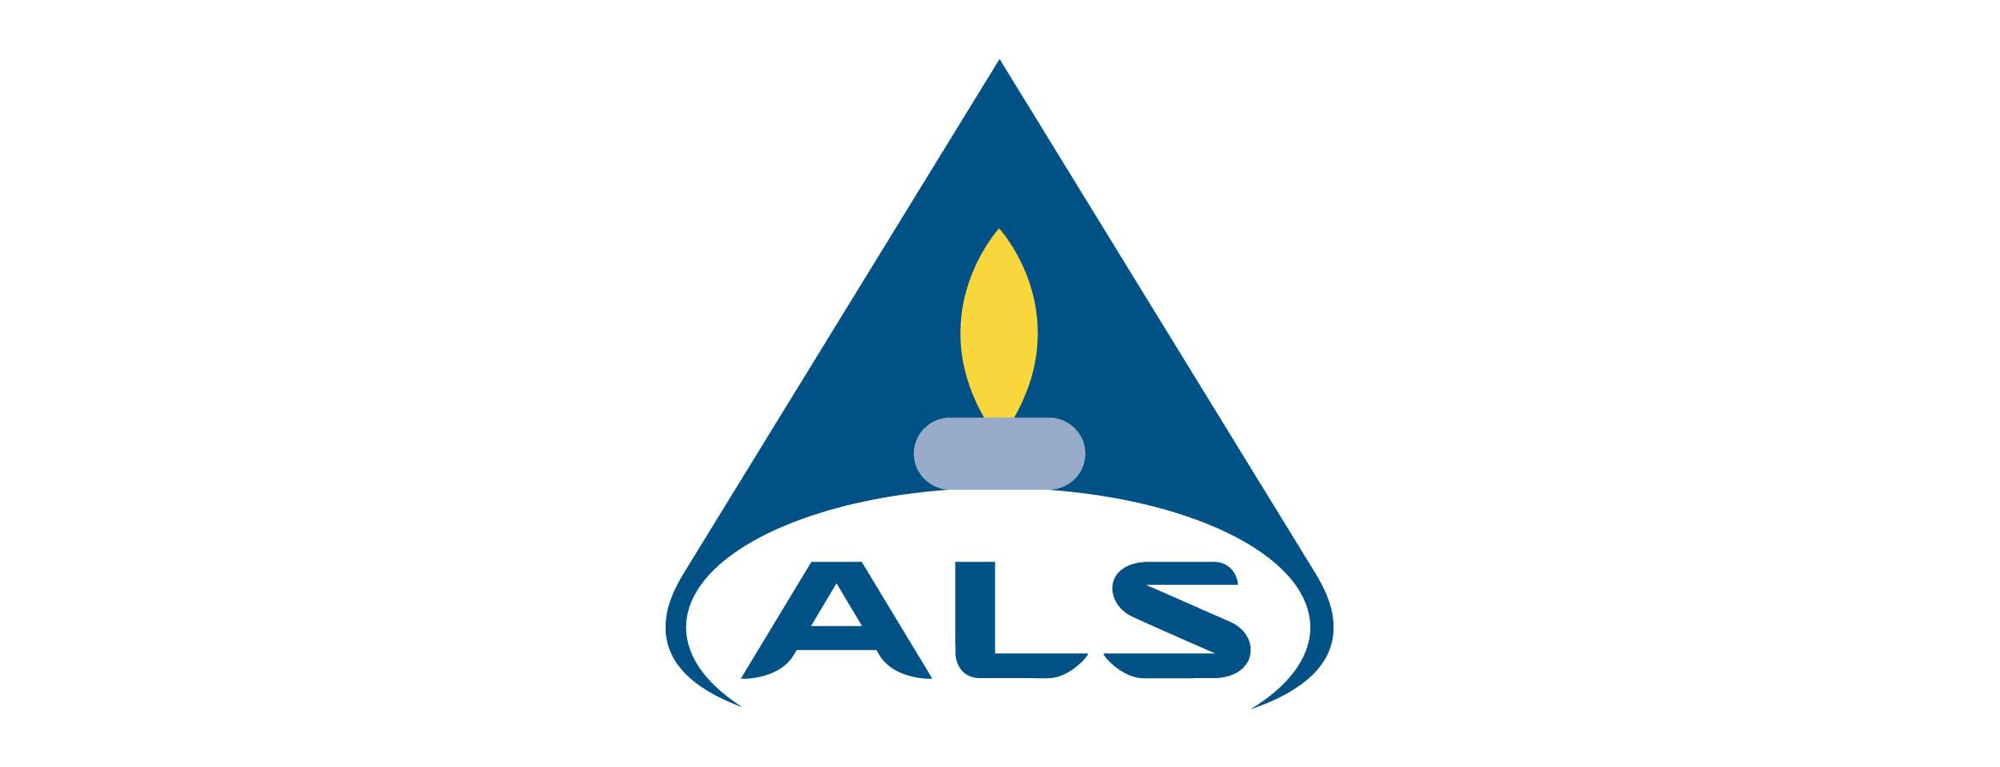 klient-wooacademy-als-logo